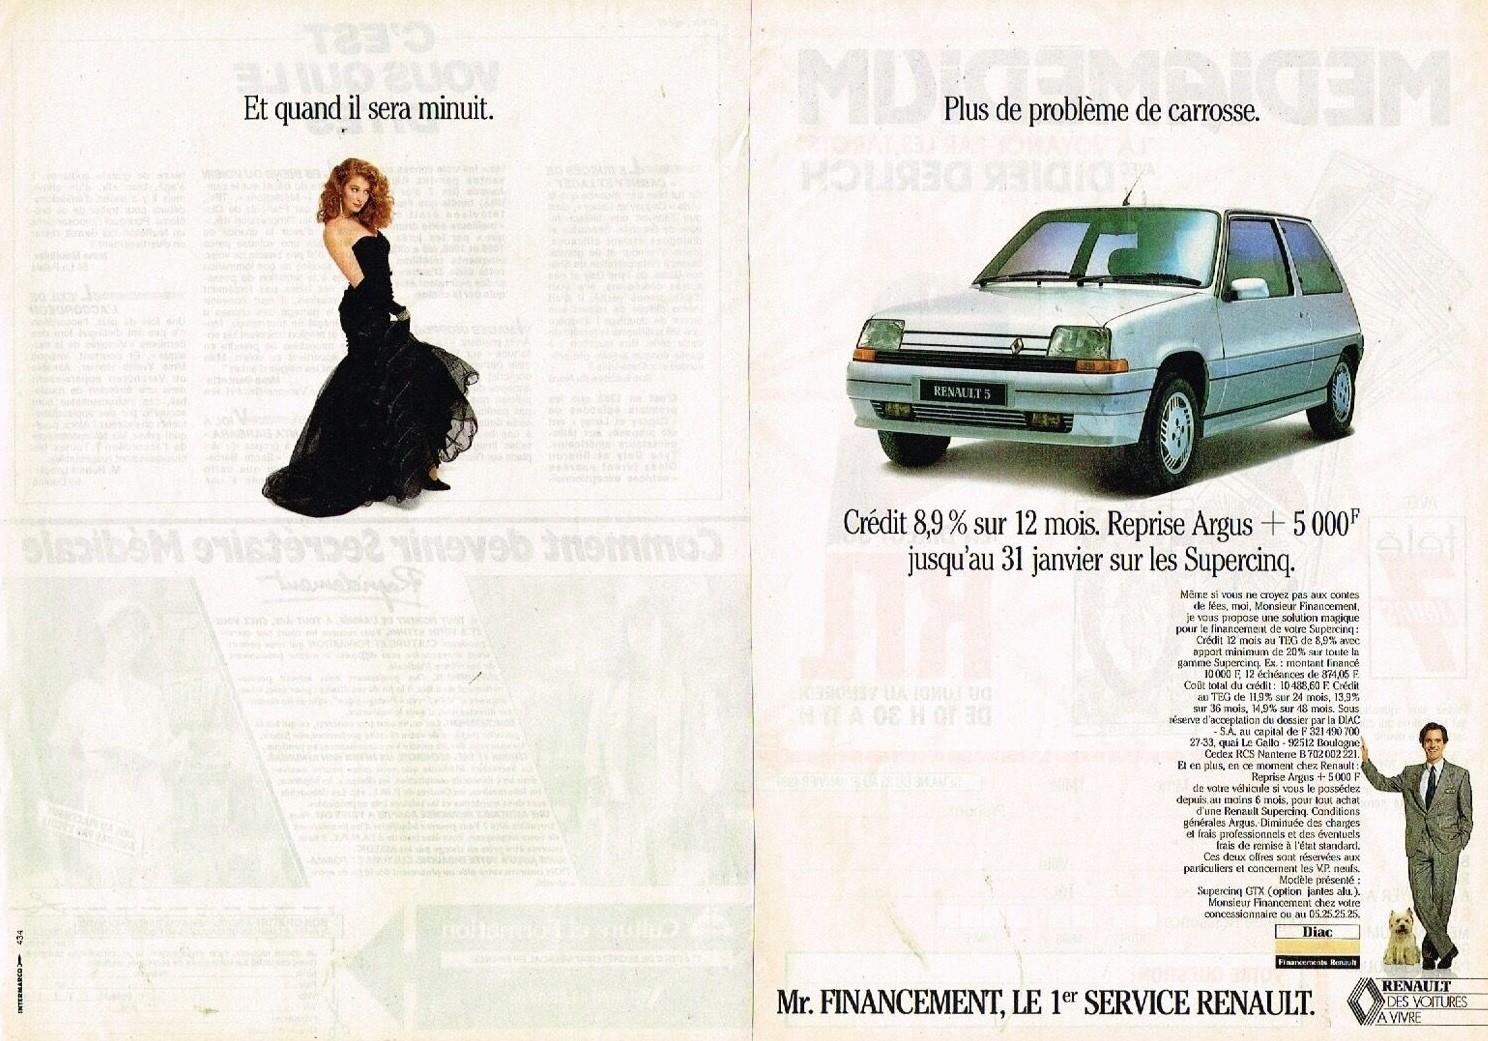 1989 Renault Financement Renault 5 Supercinq A2